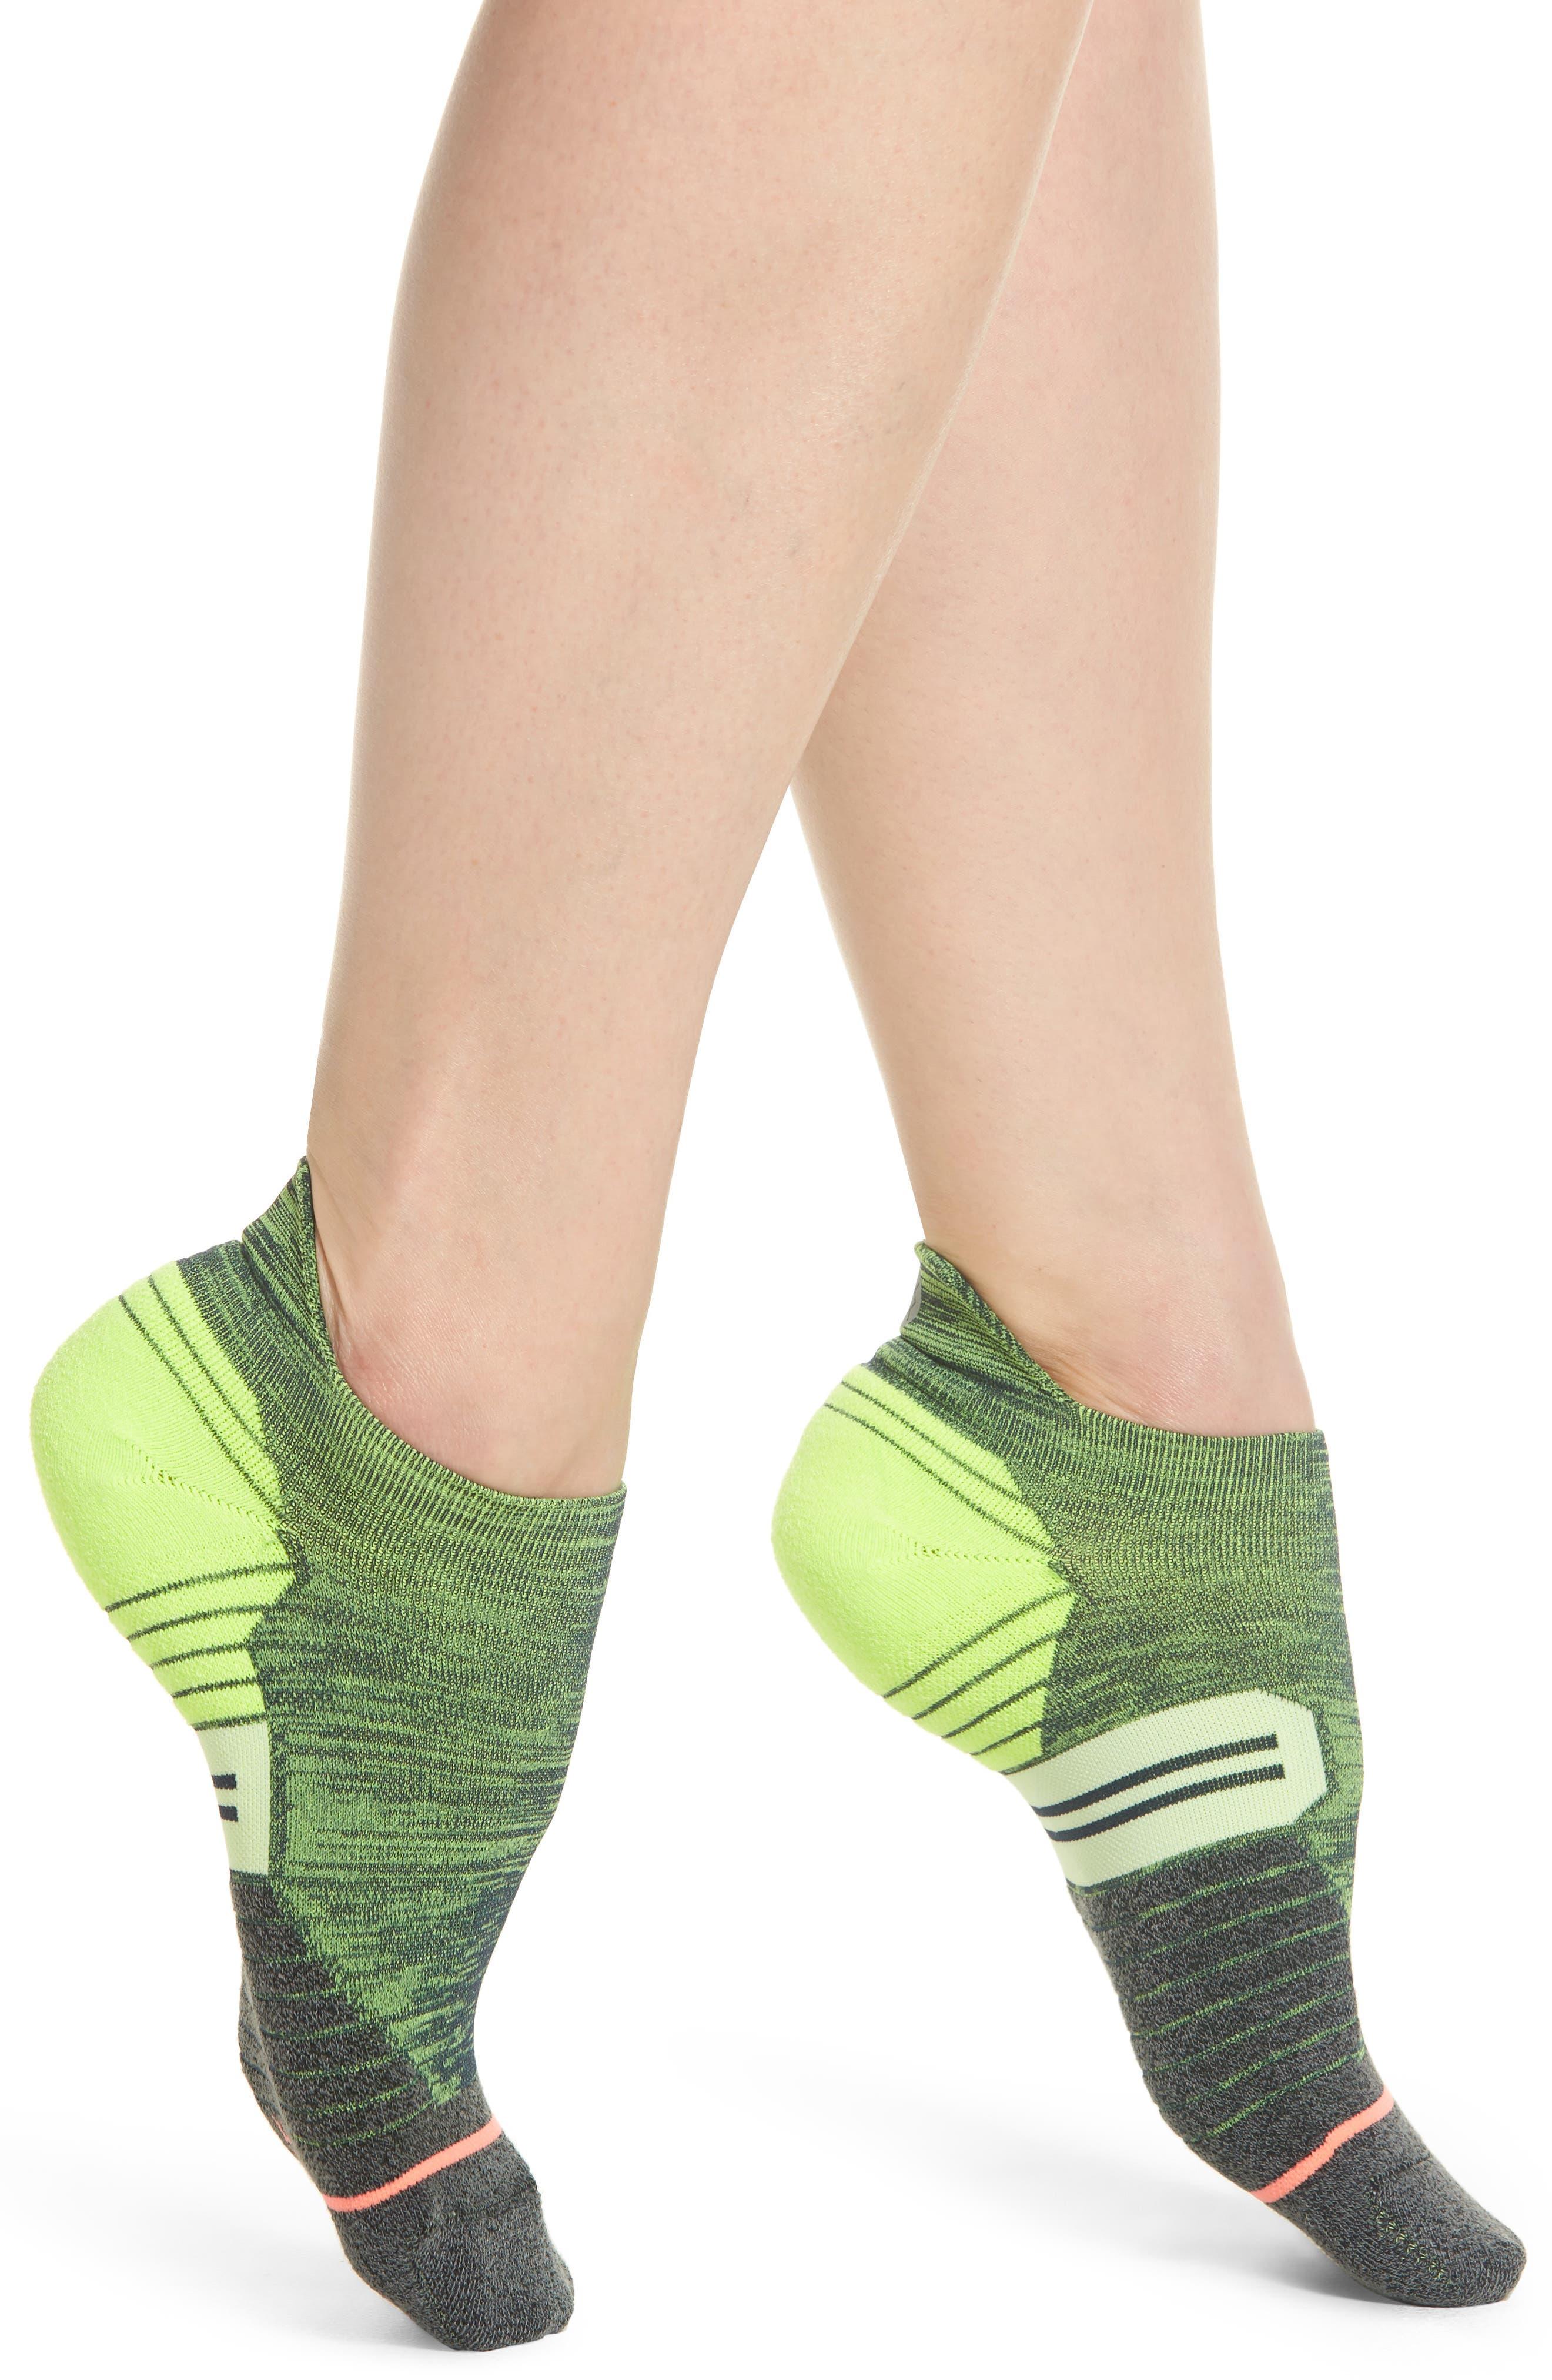 Distance Tab Running Socks,                         Main,                         color, Green